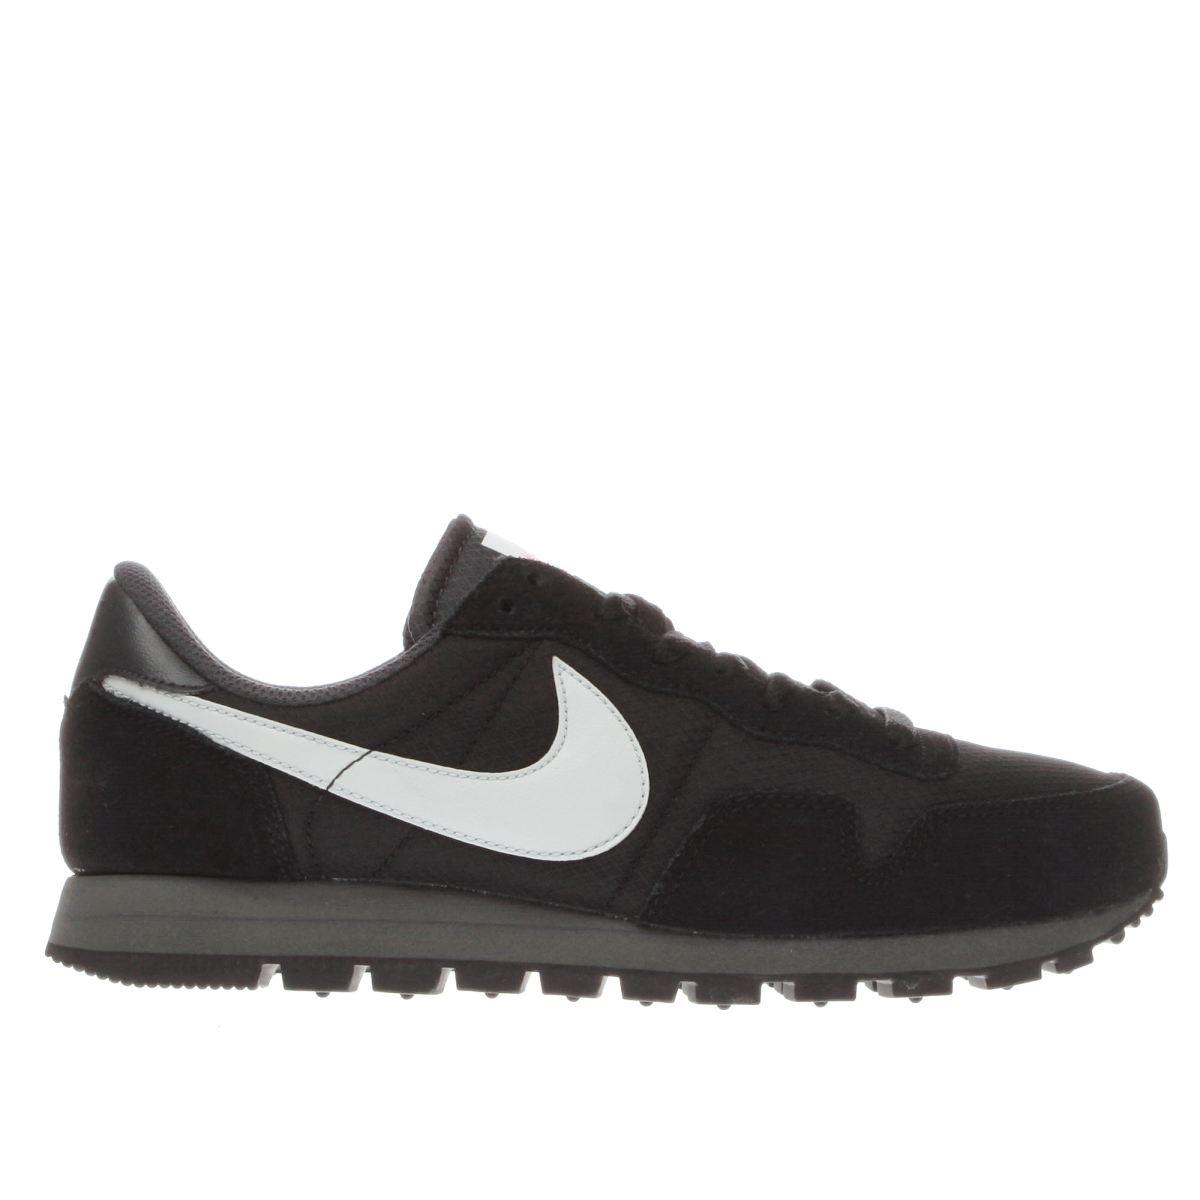 nike black & white air pegasus 83 trainers